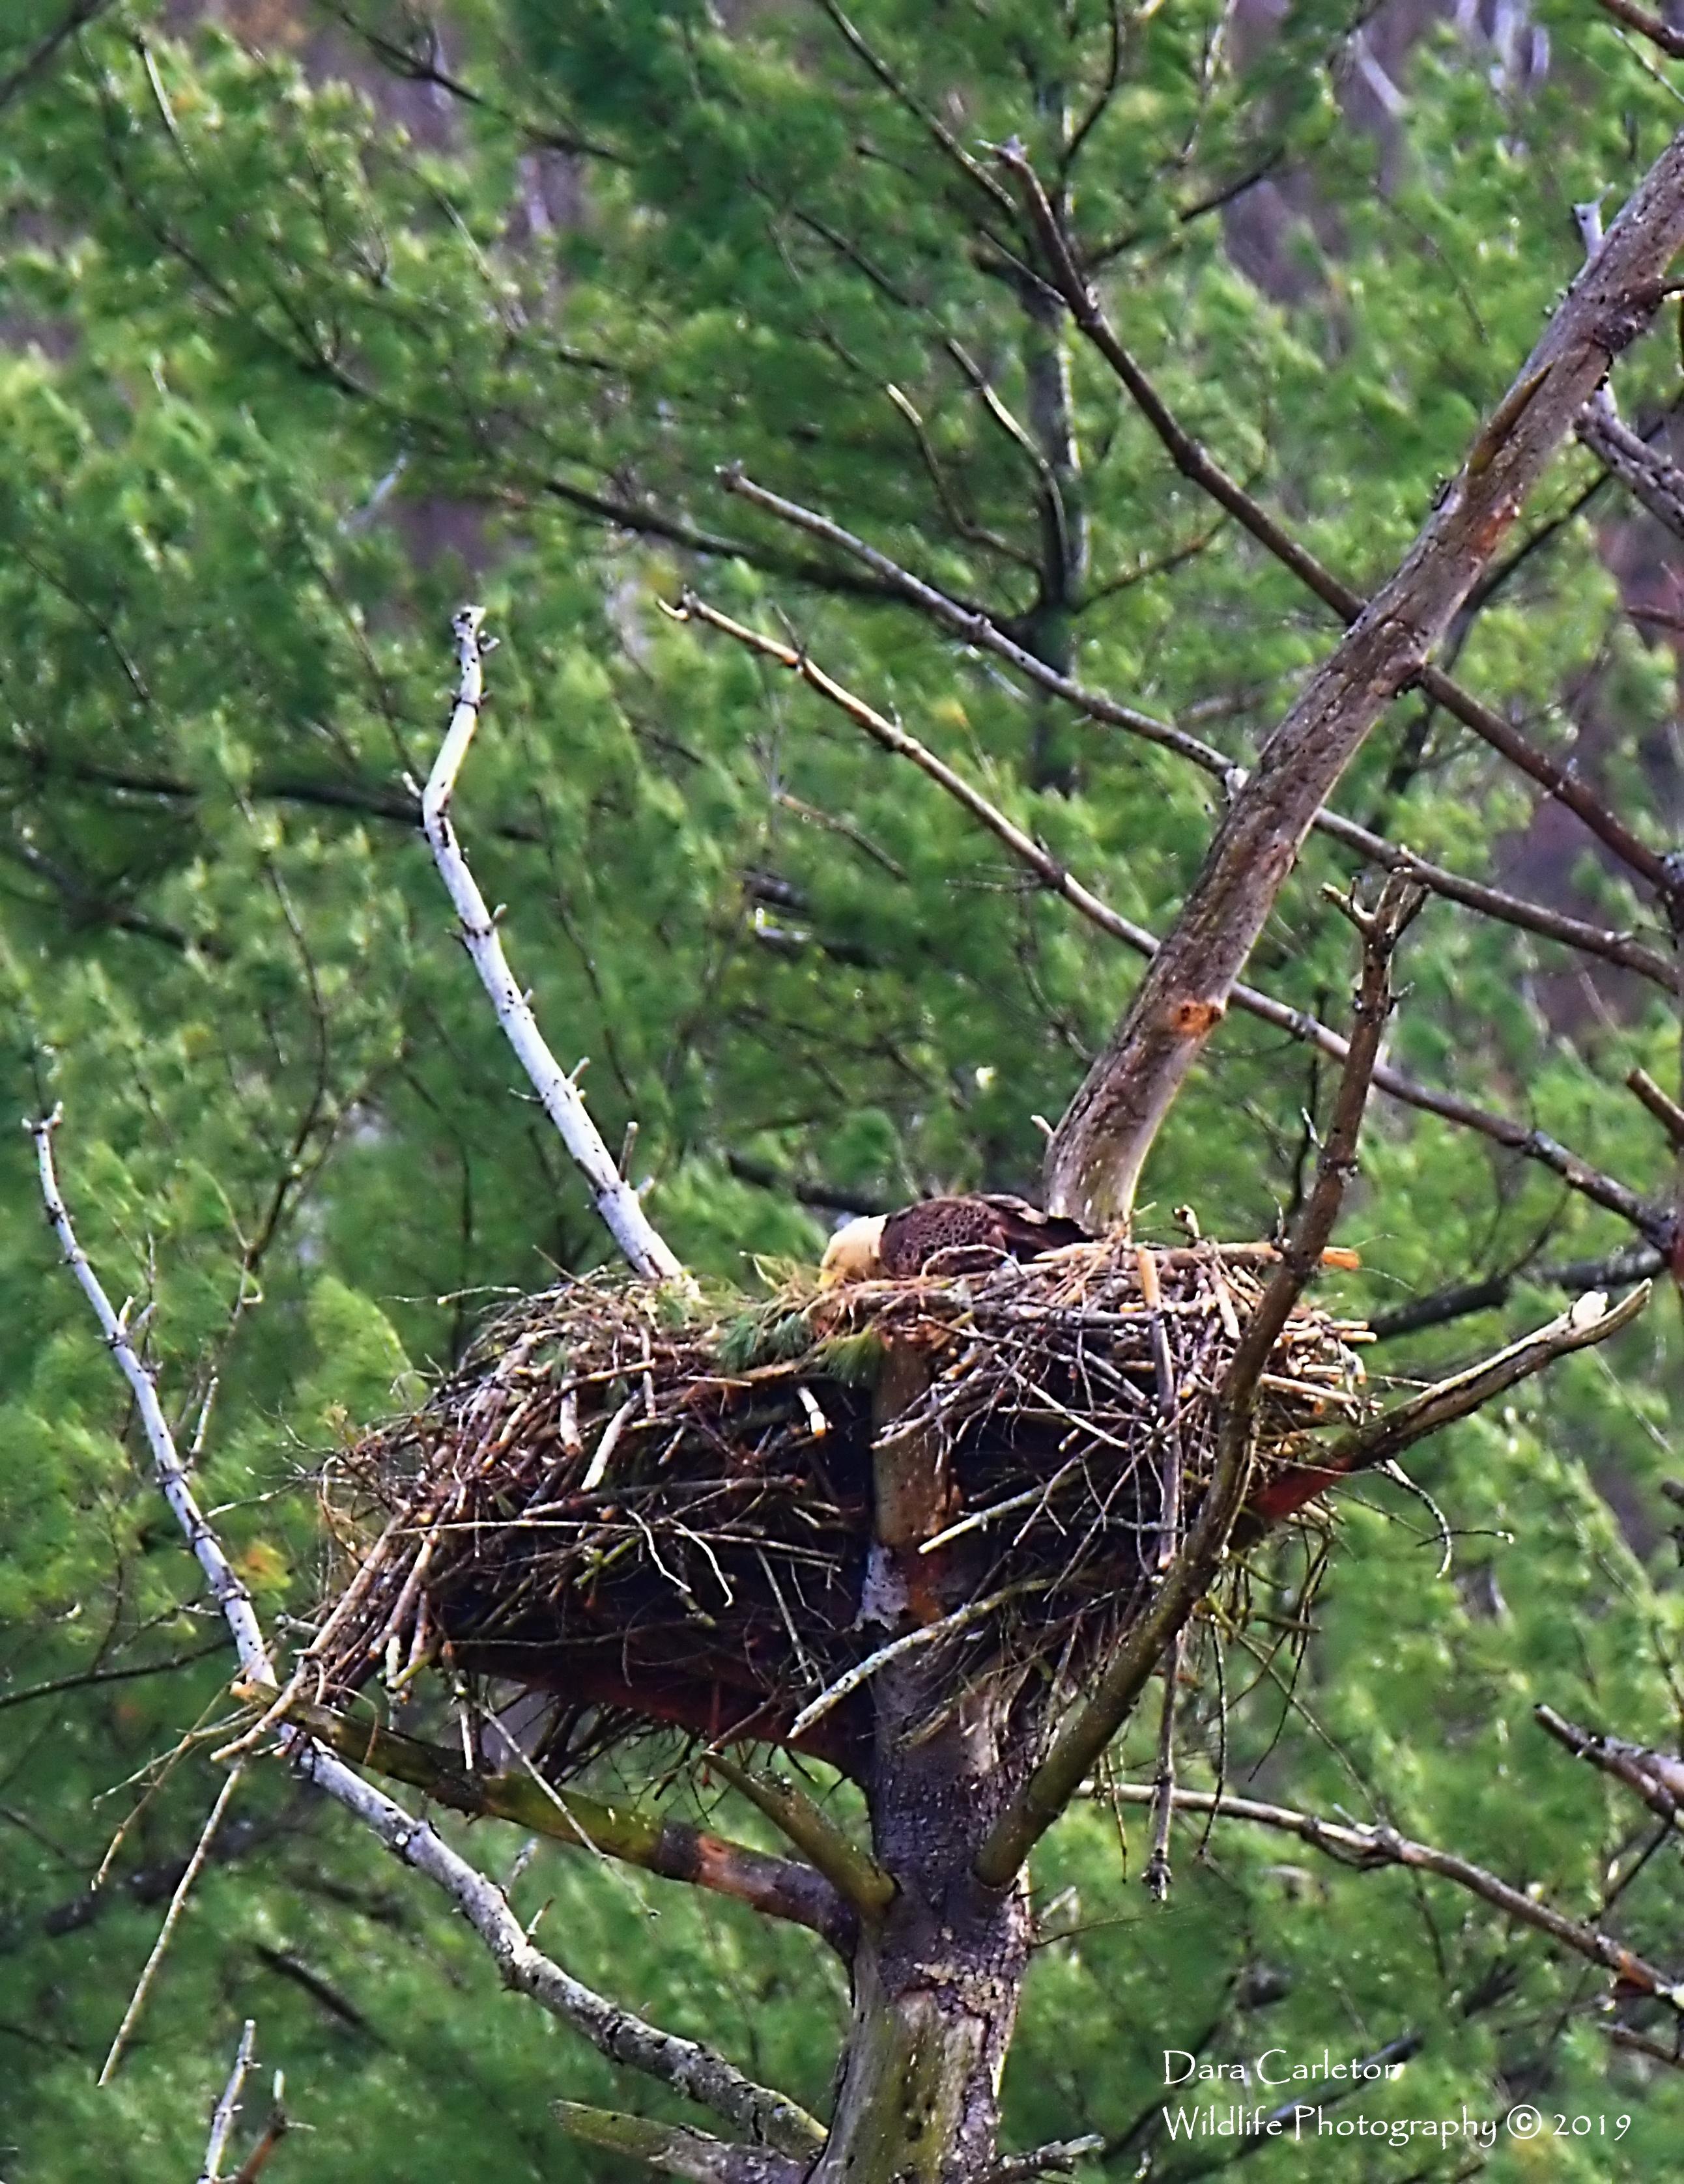 TOWNSHEND APR 30 2019 in nest